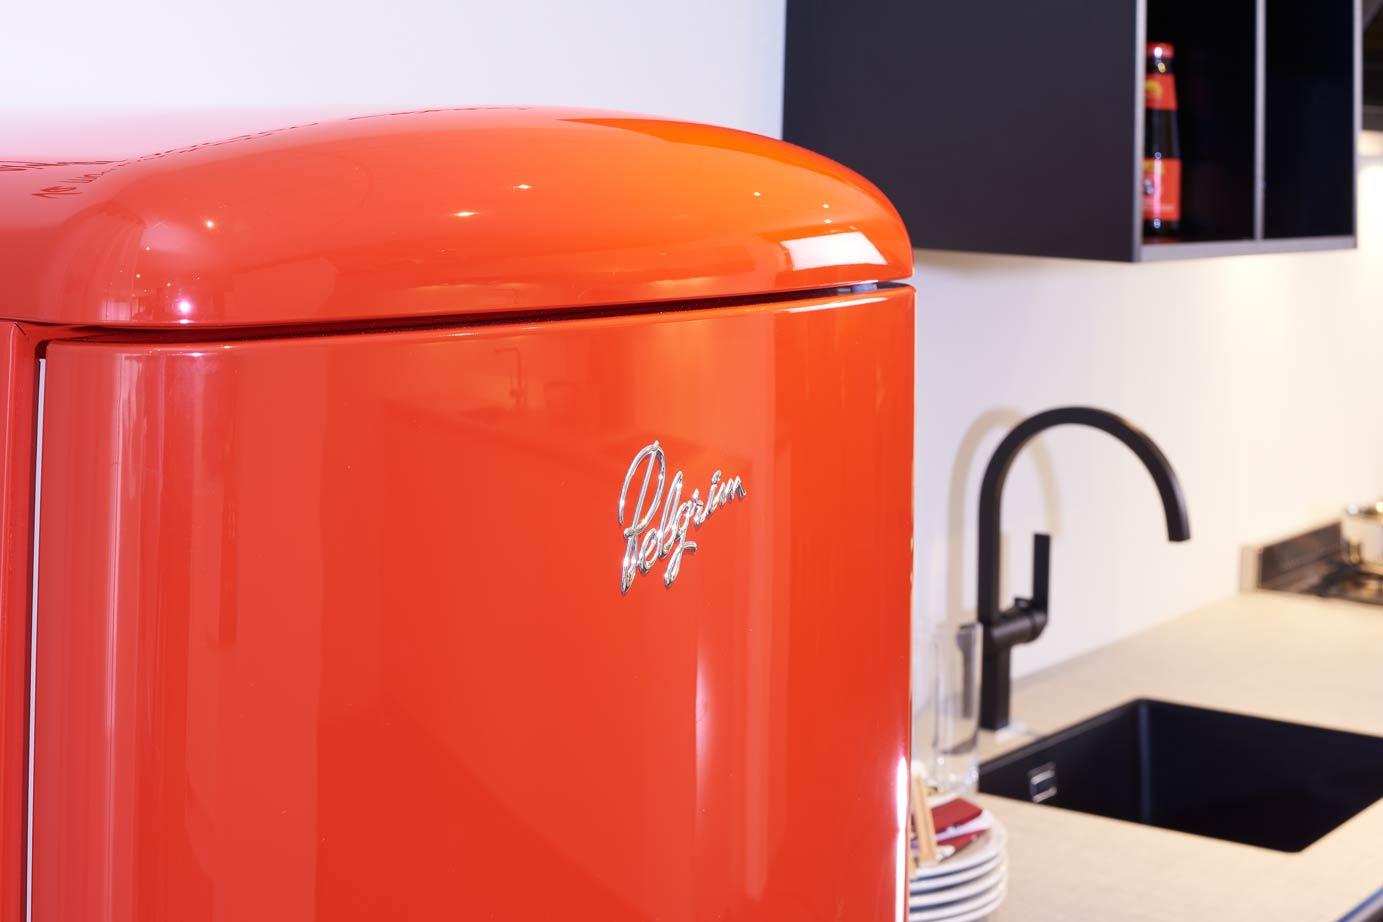 Moderne Keuken Kleuren : Moderne keuken met rode contrasten – DB Keukens